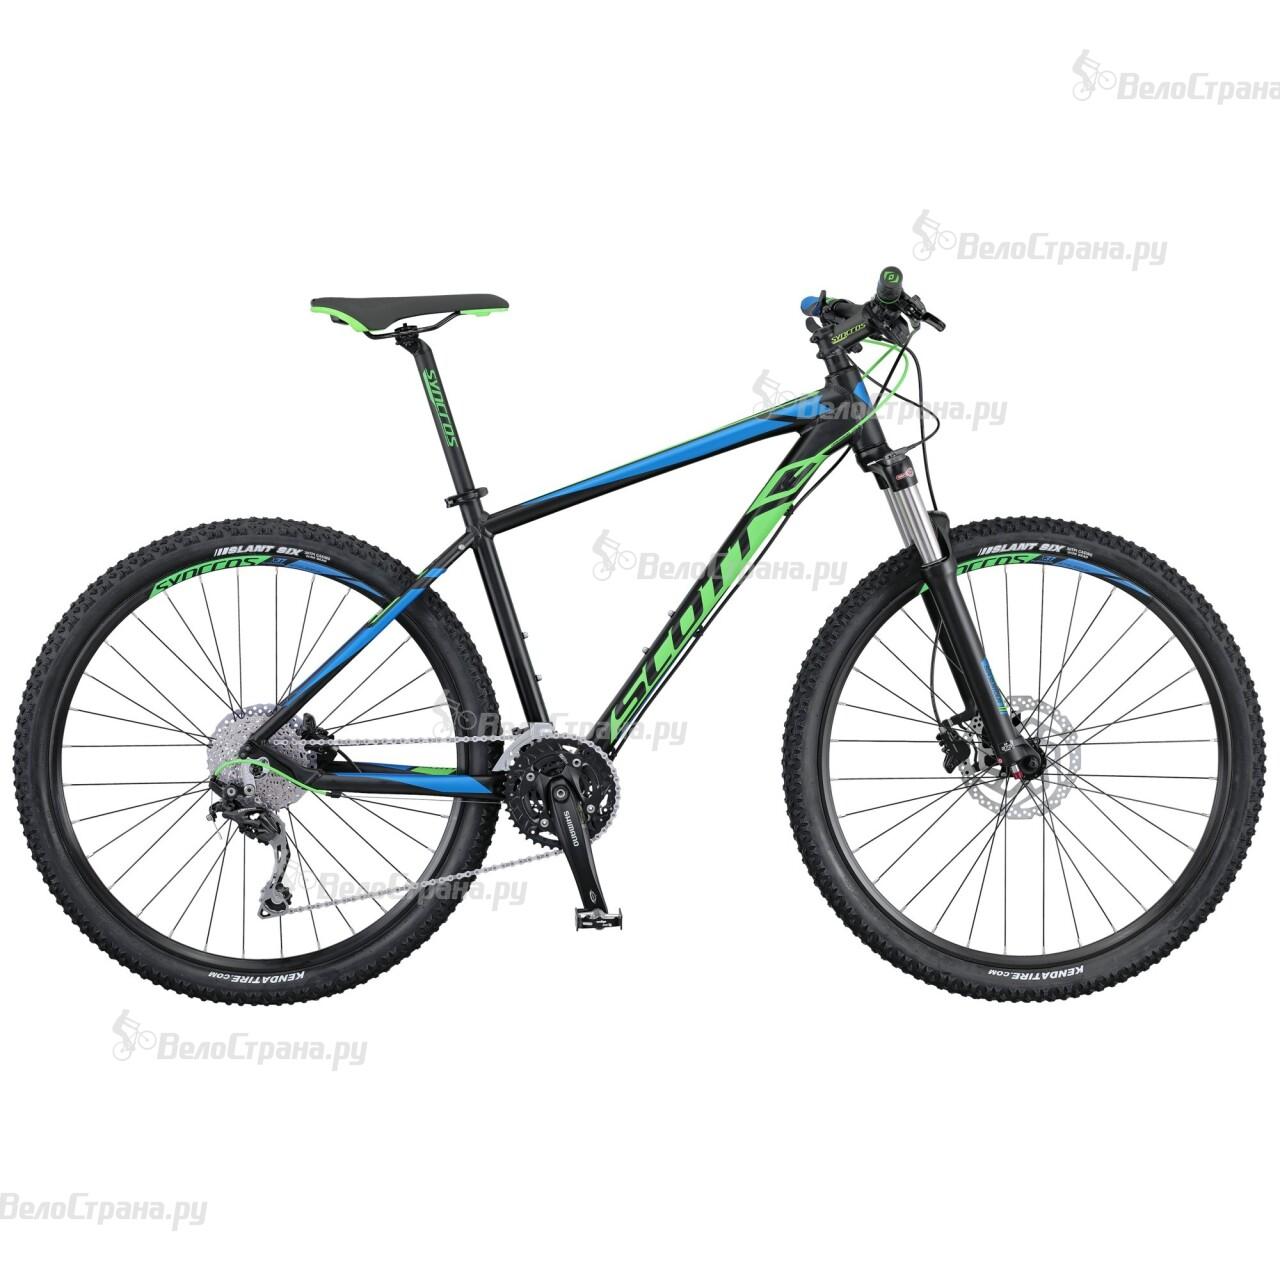 Велосипед Scott Aspect 720 (2016)